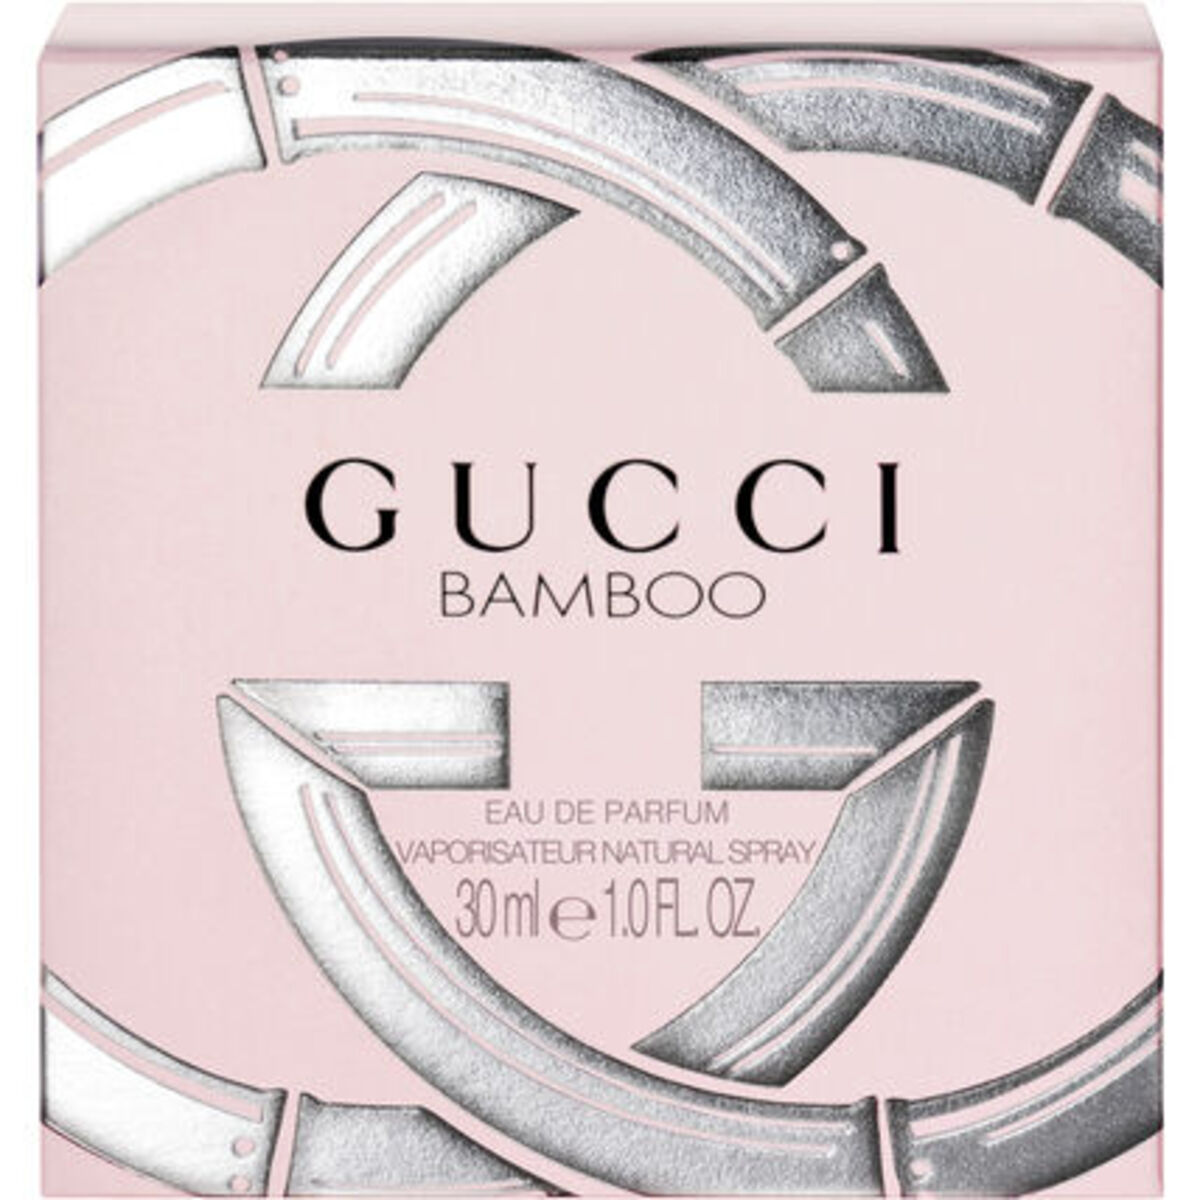 Bild 2 von Gucci Bamboo, Eau de Parfum